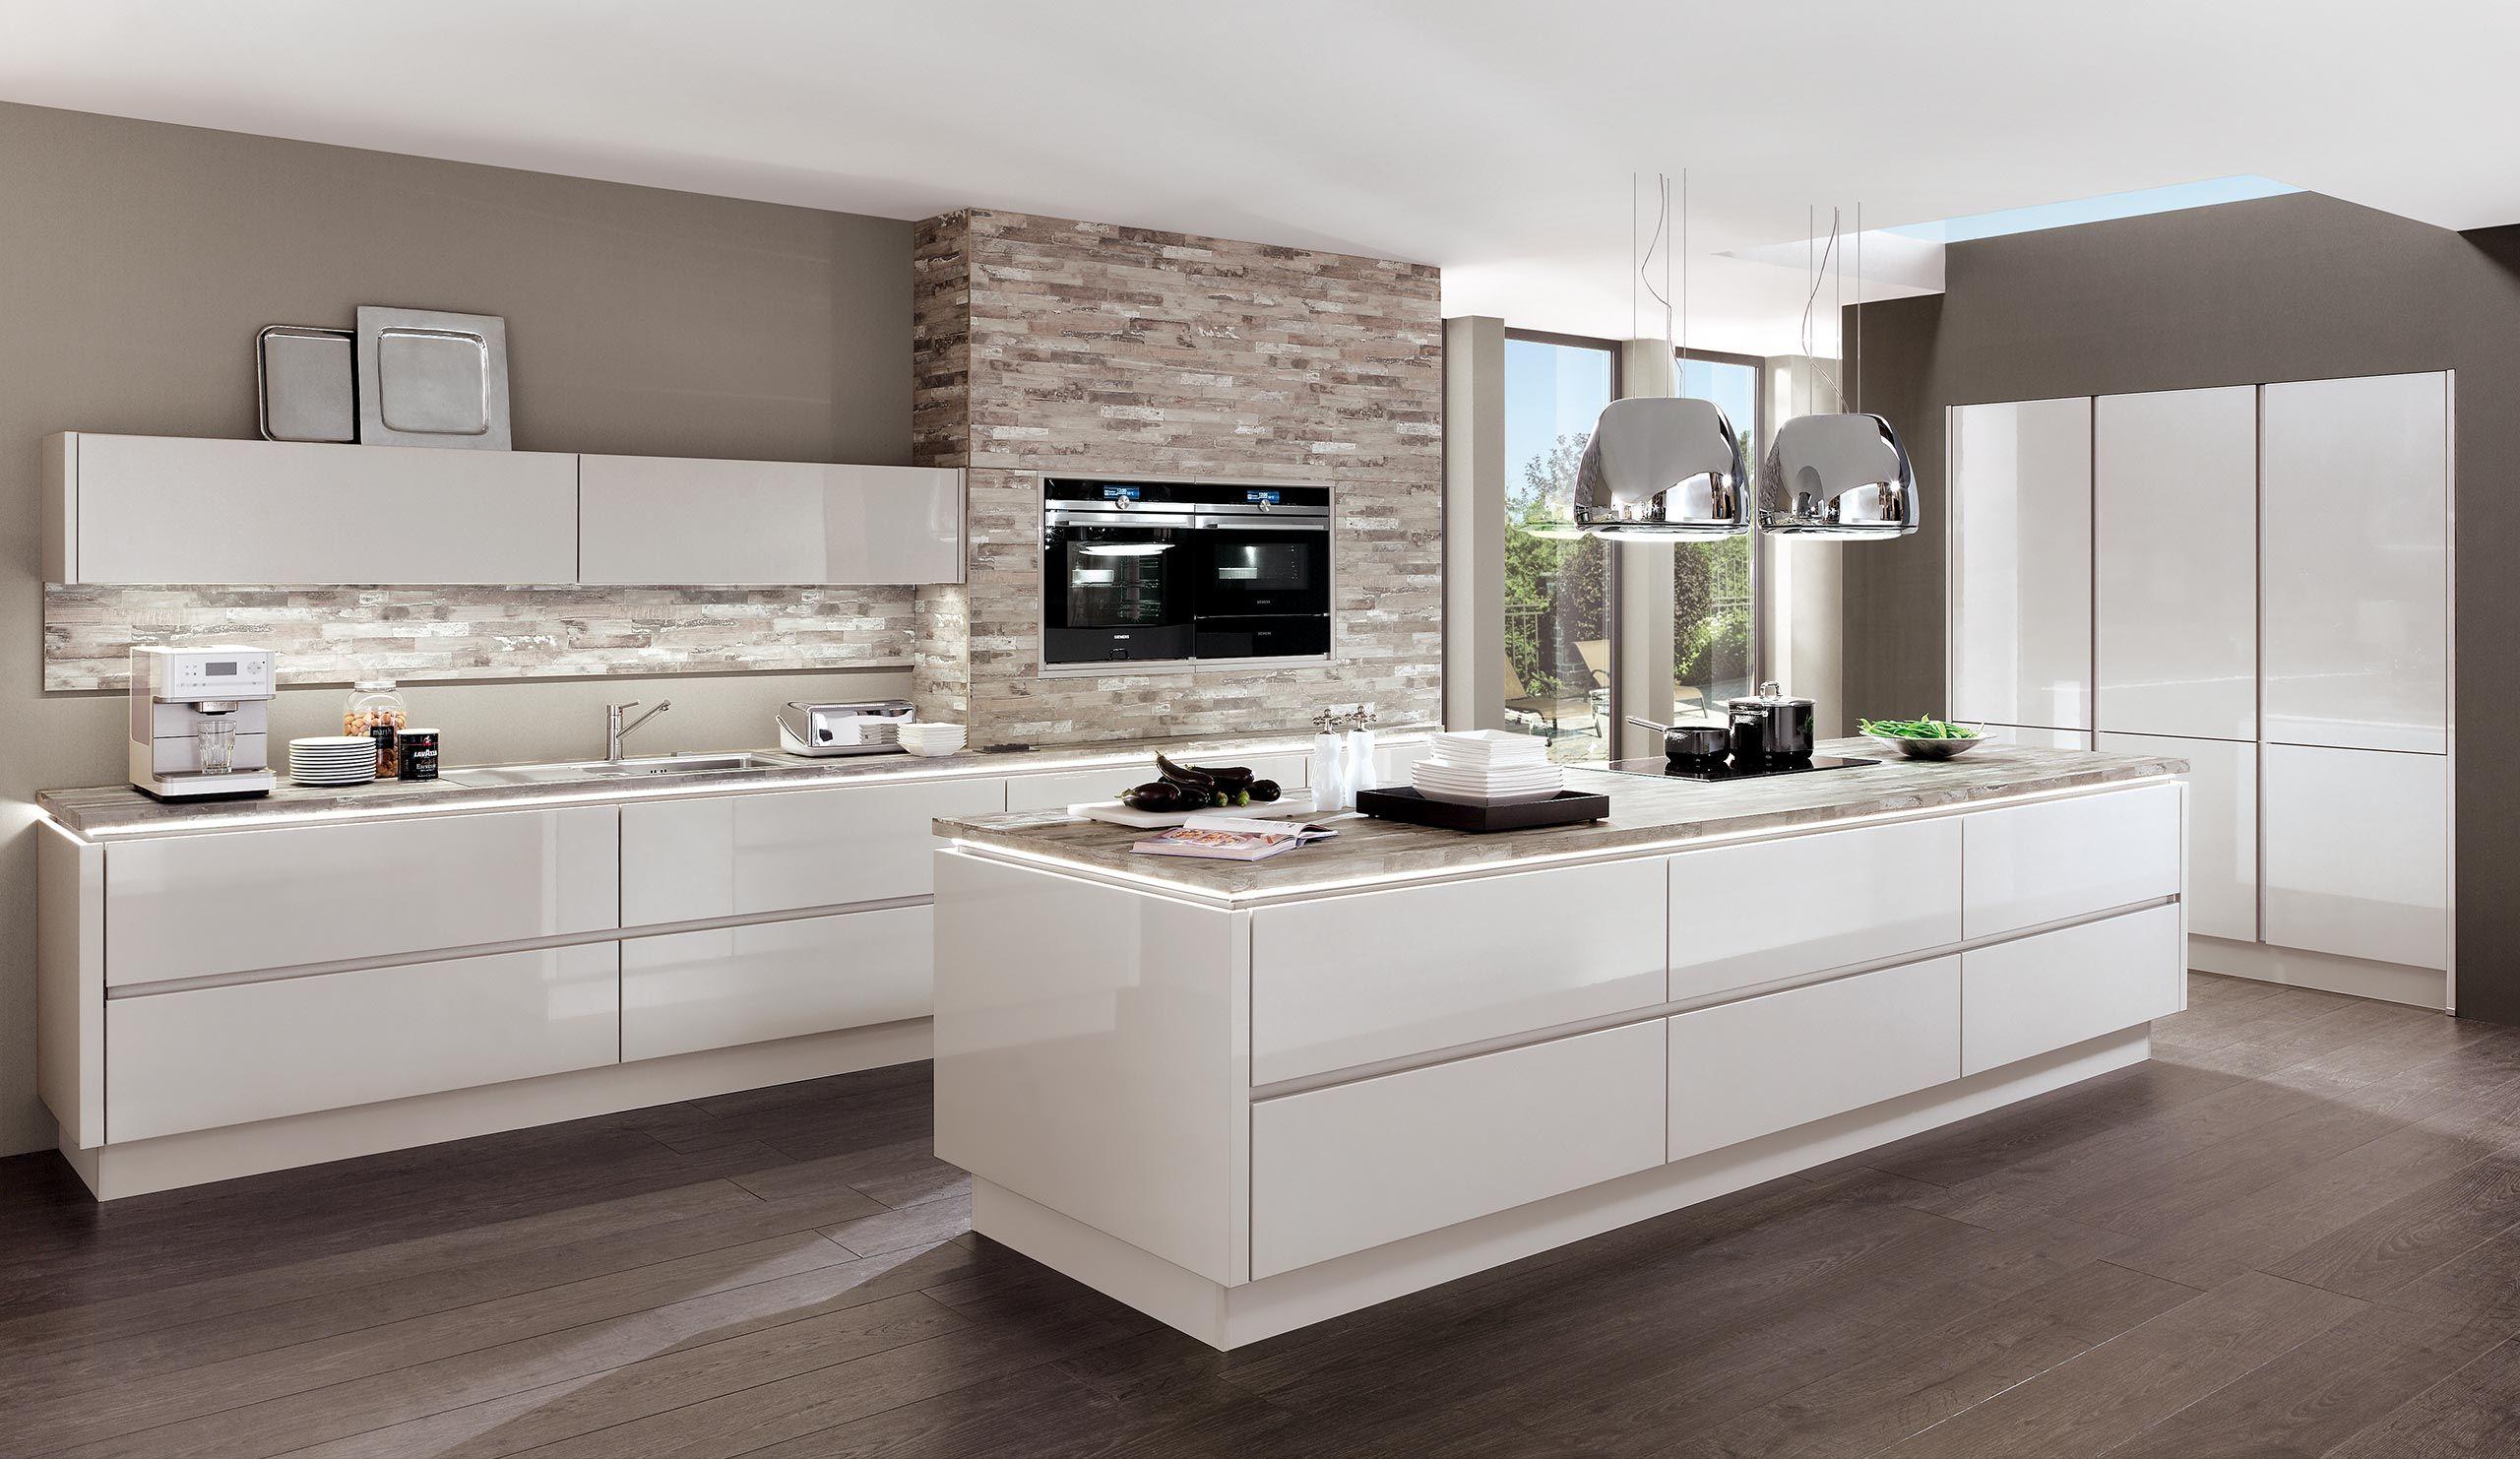 einbauk che norina 9555 weiss hochglanz lack beautiful. Black Bedroom Furniture Sets. Home Design Ideas